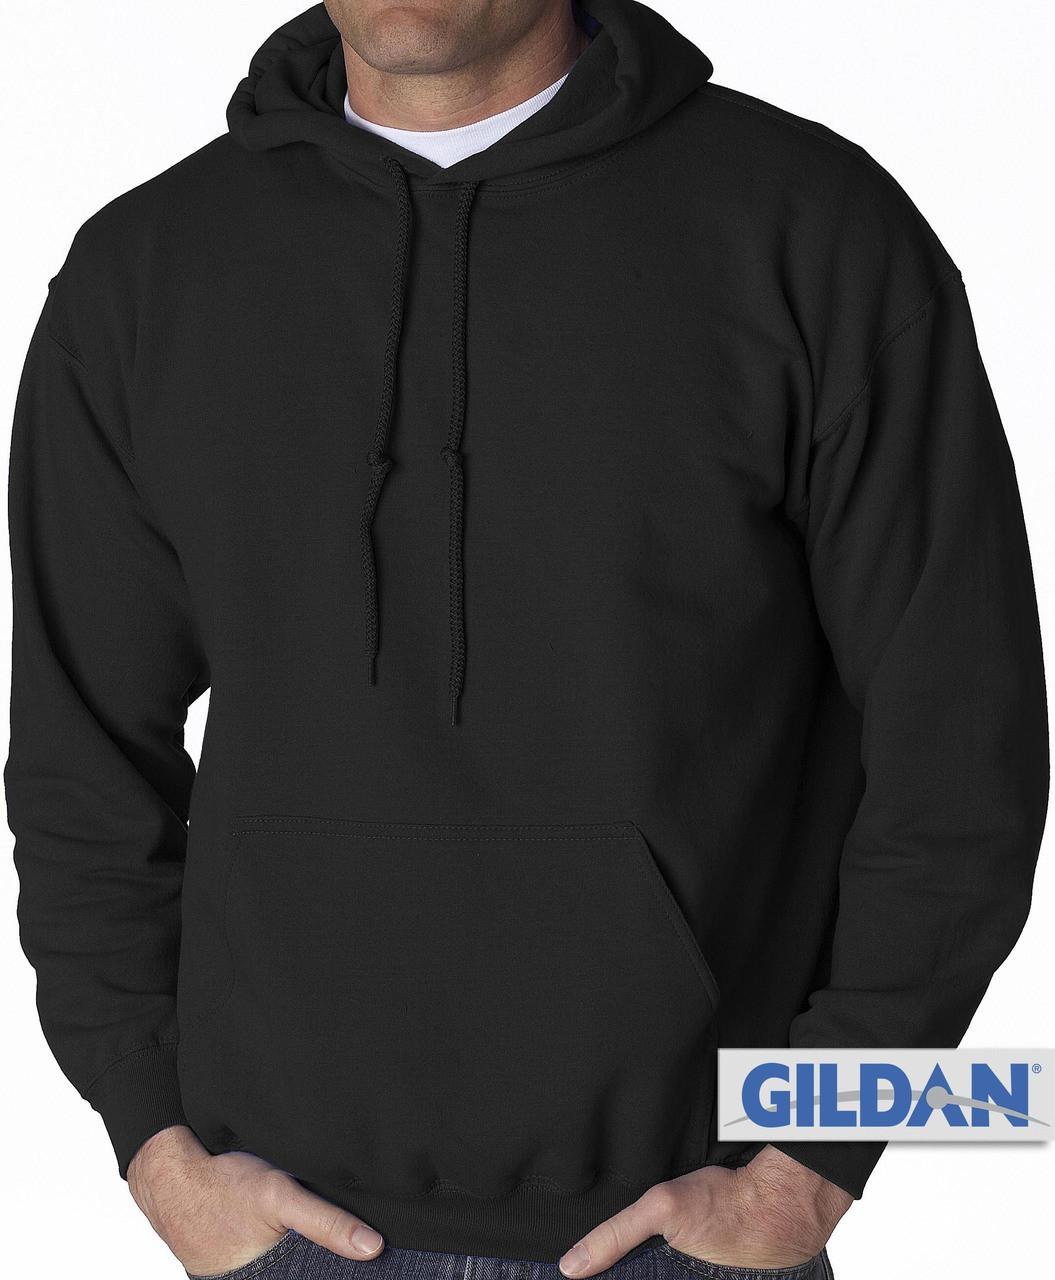 b69eece1d9dfb5 Gildan Pullover Hoodie Black 3XL 4XL 5XL  369. Image 1. Click to enlarge